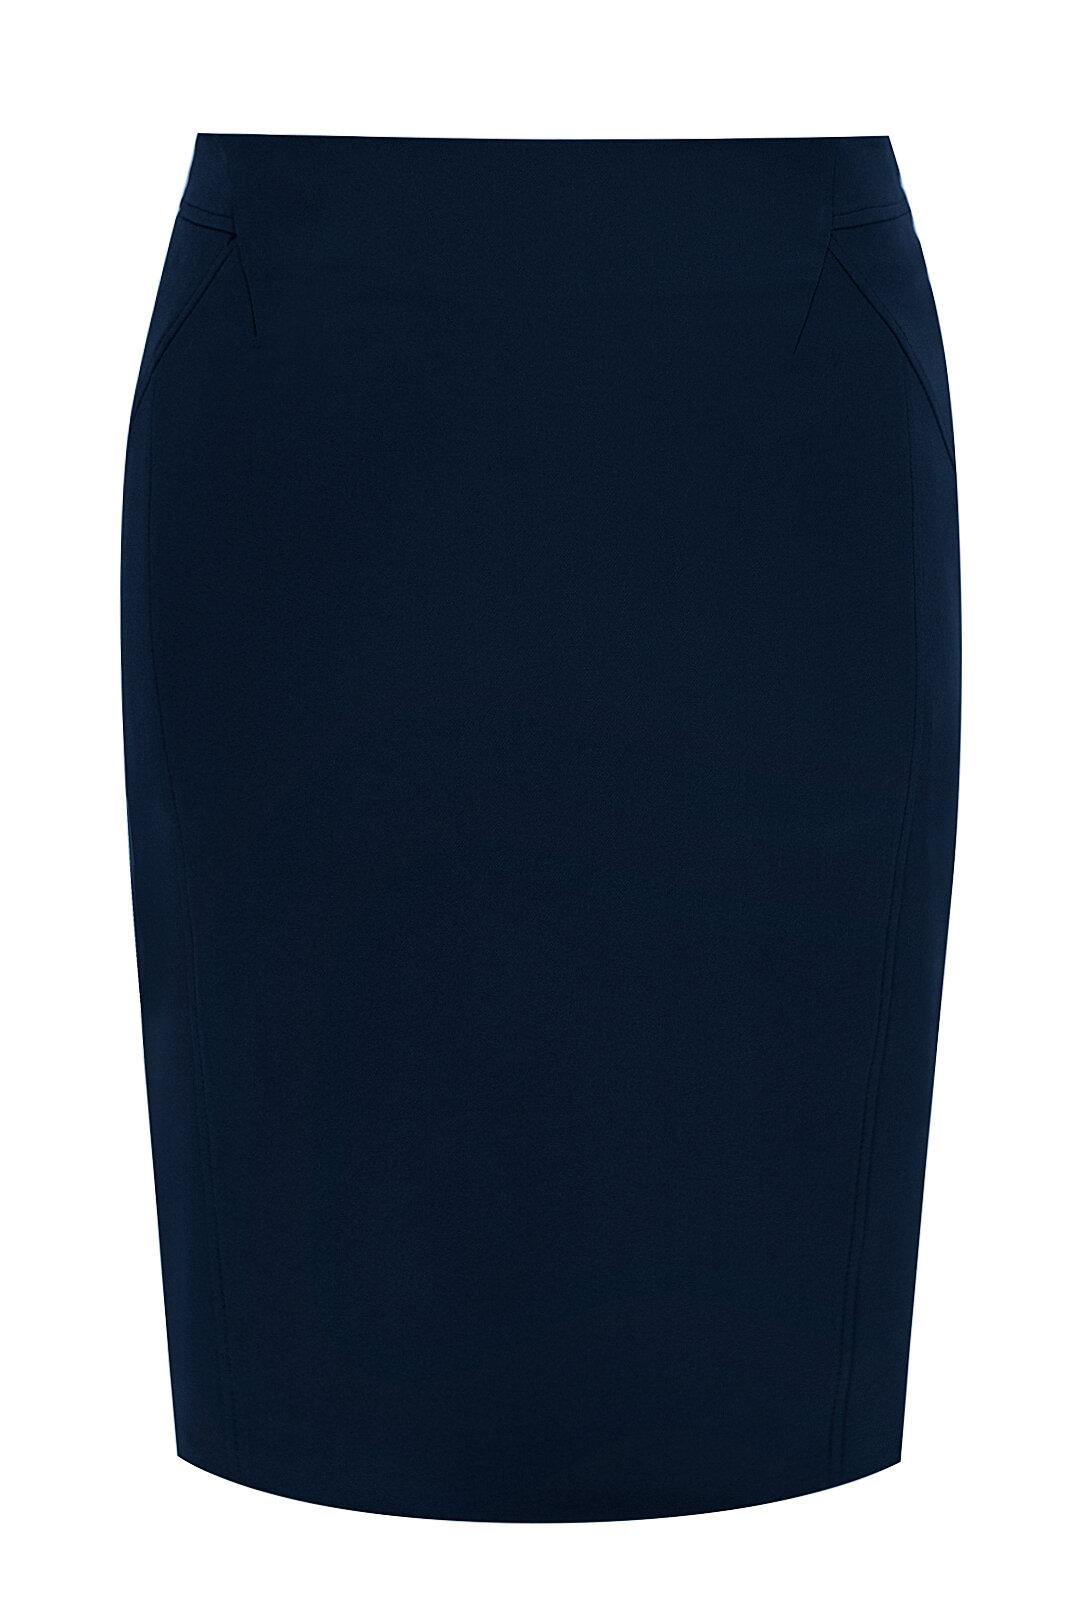 модели юбки карандаш фото сборе